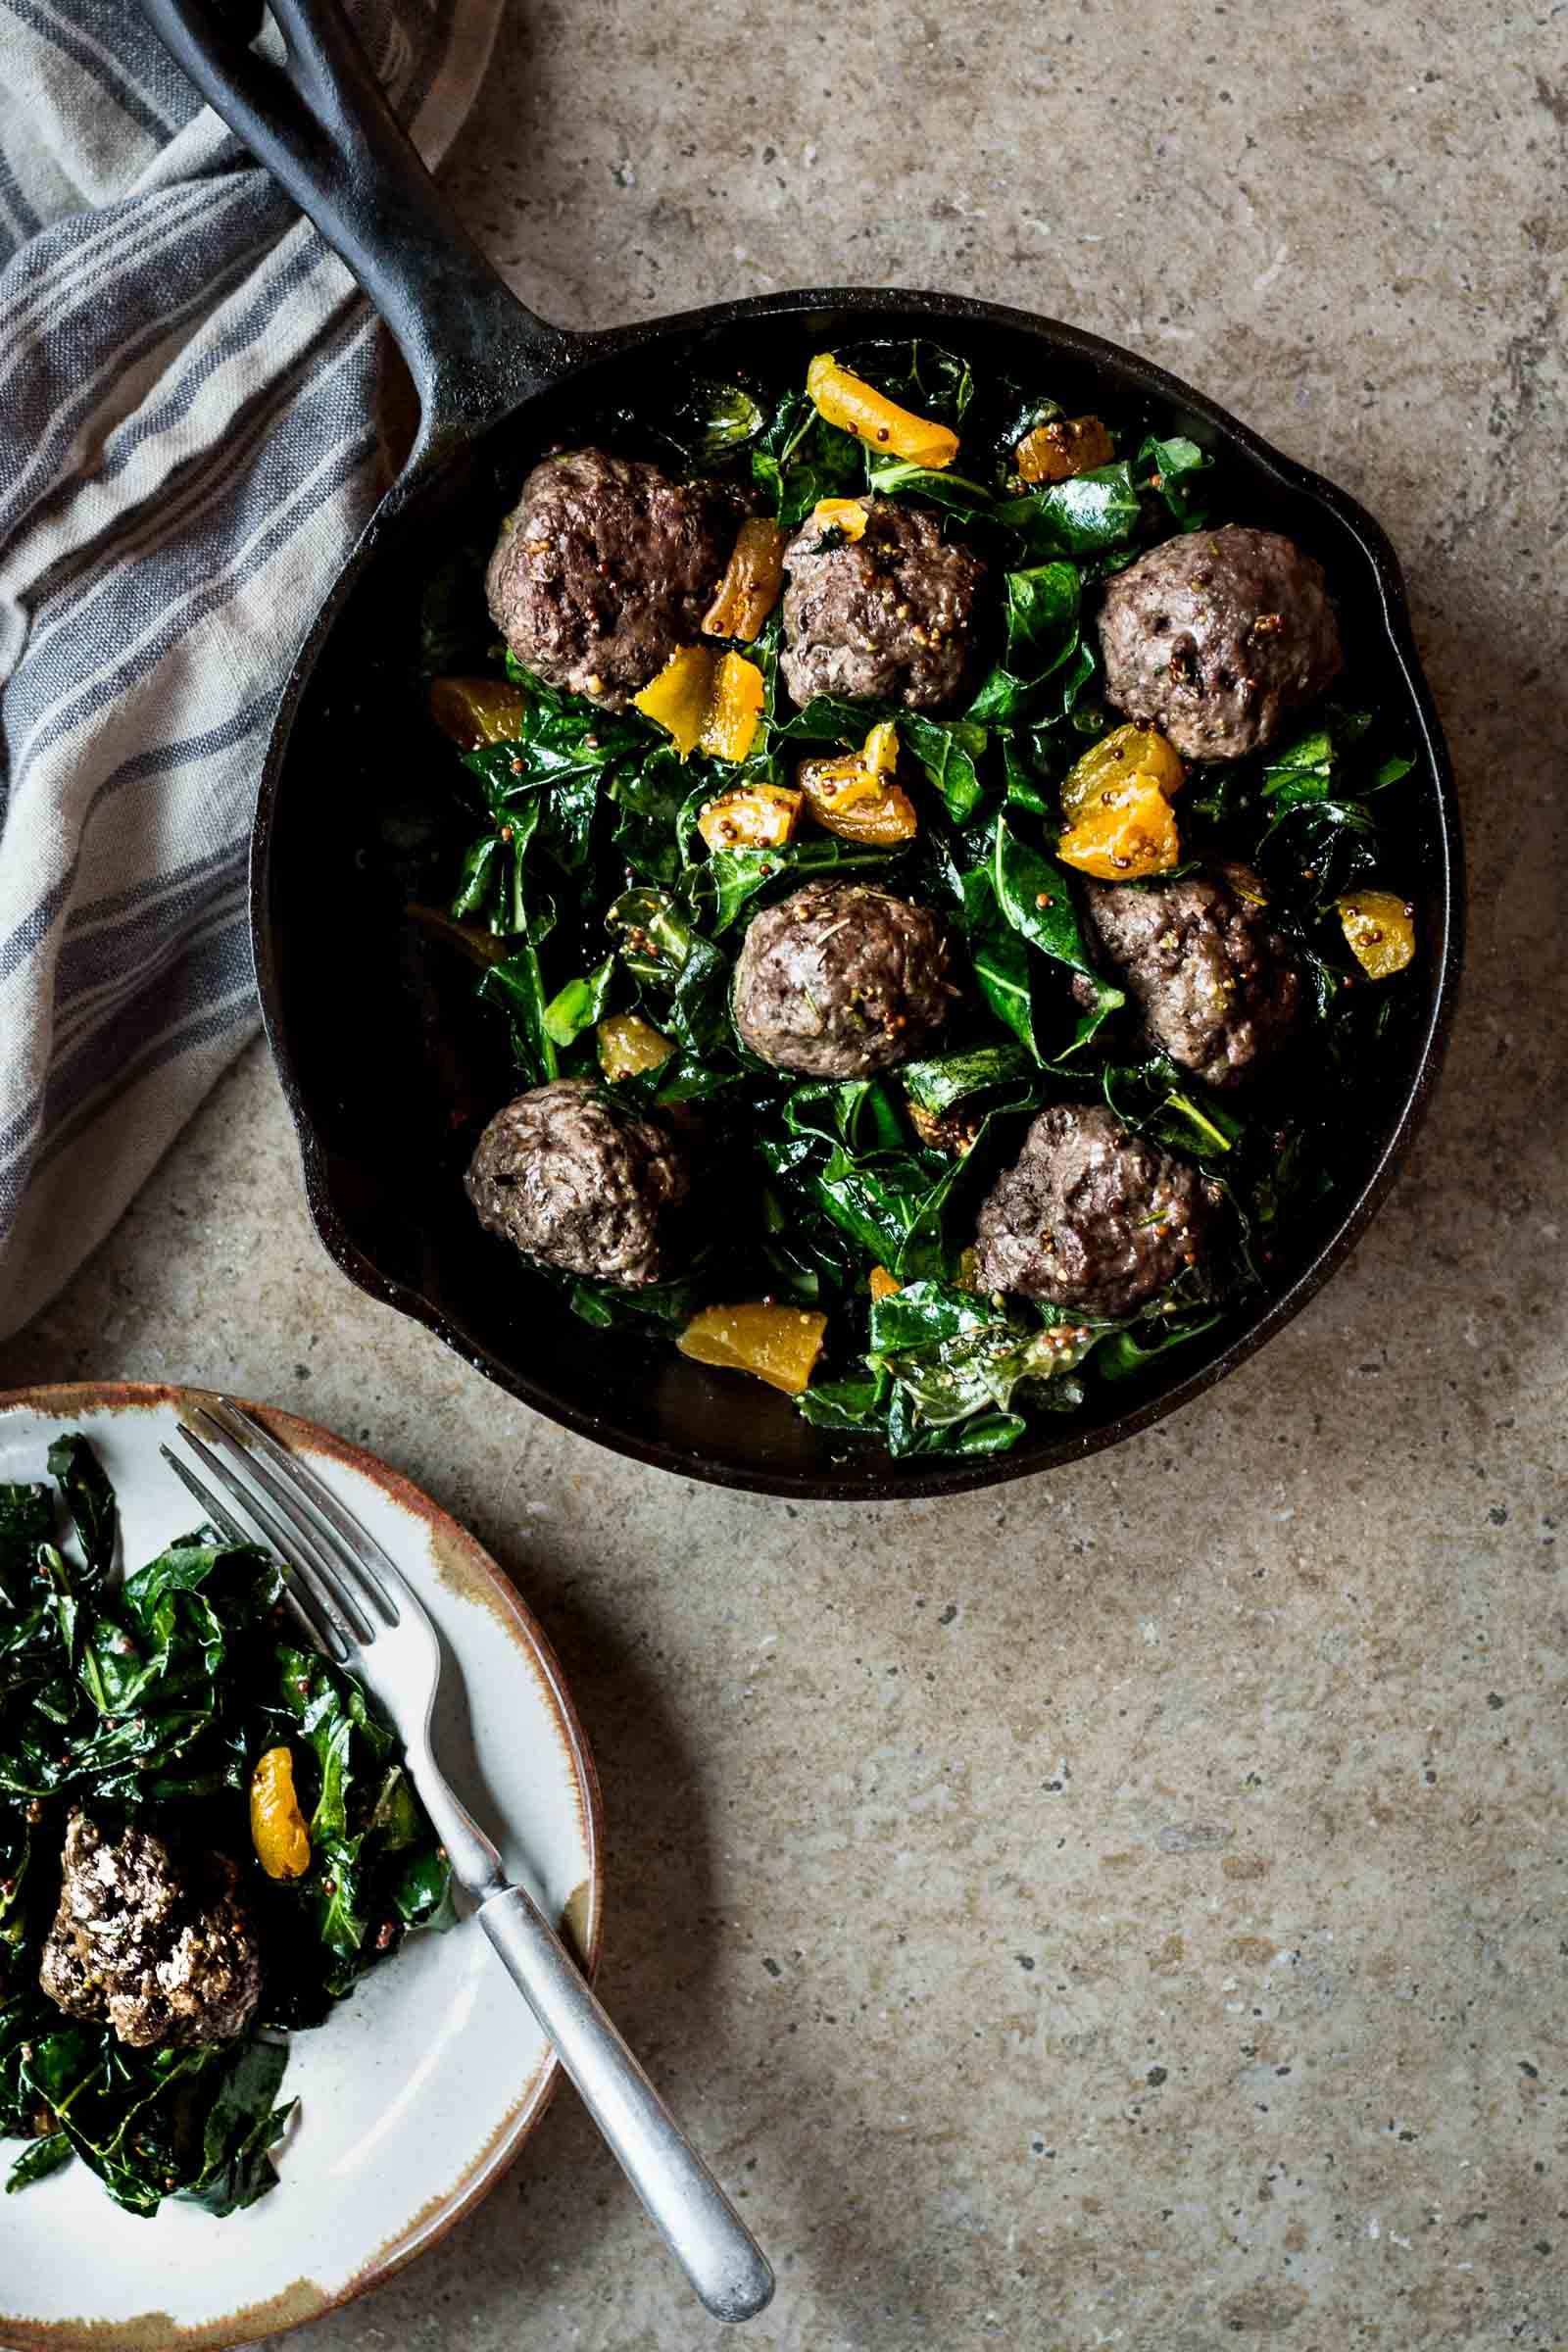 Farm Stand Meatballs with Collard Greens